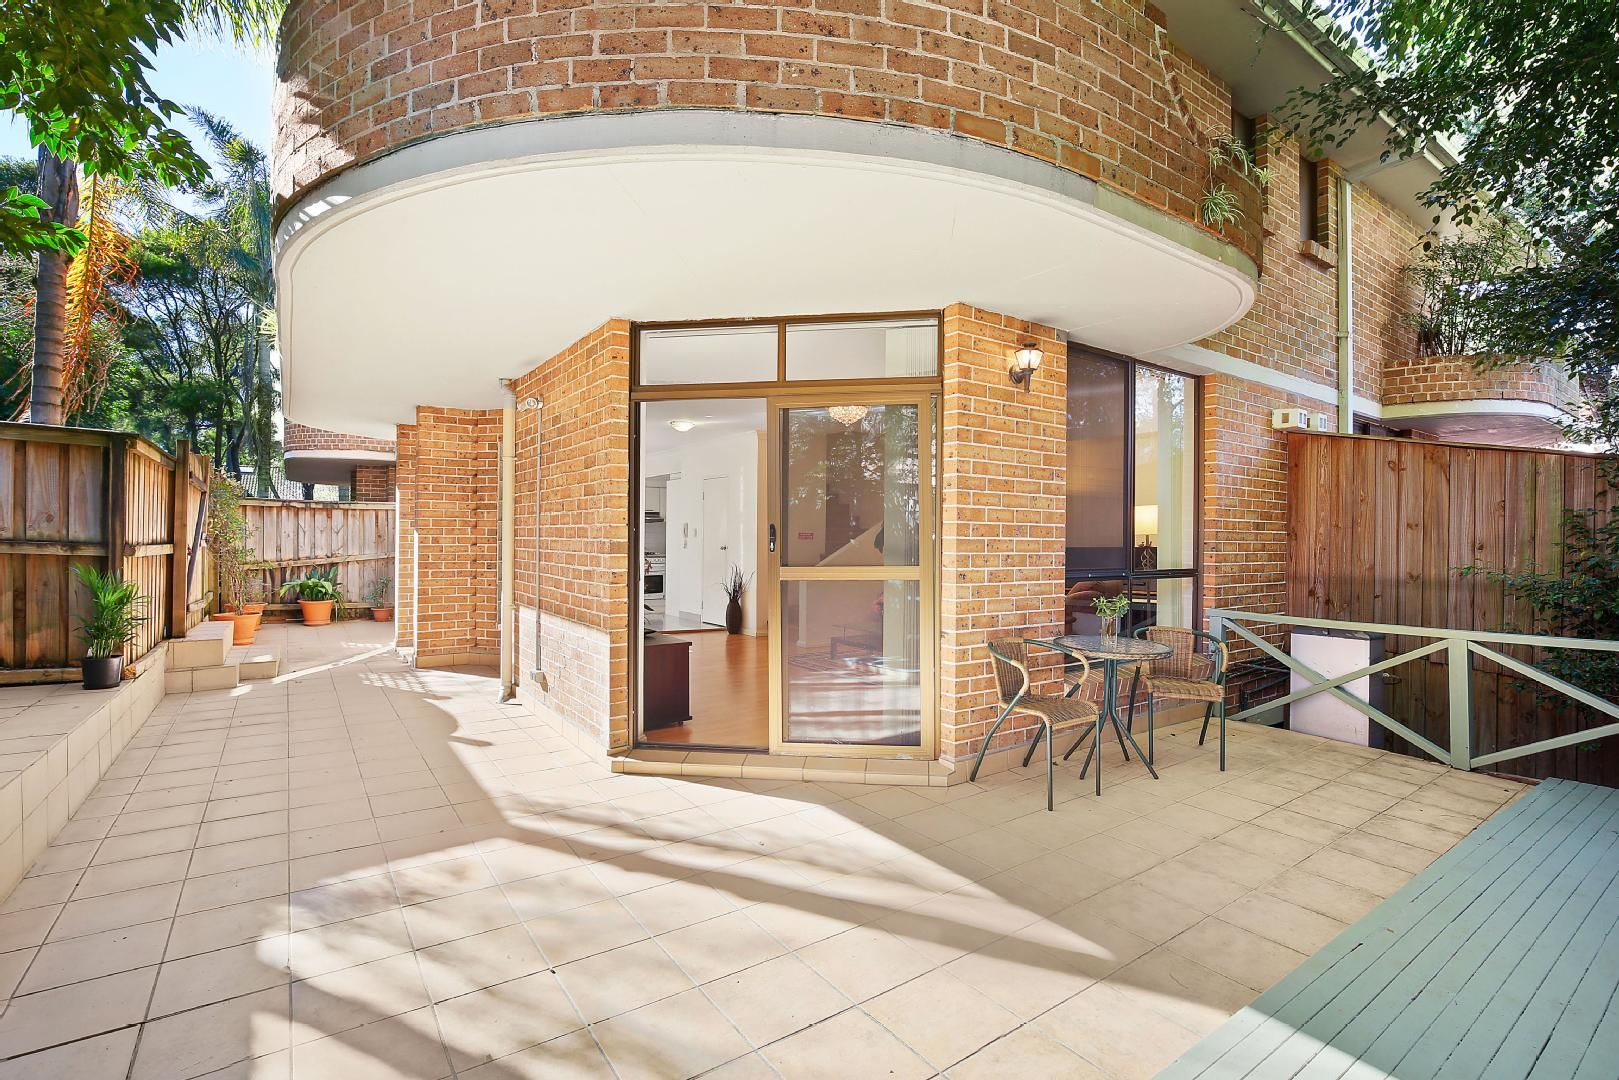 8/15-17 Milner Road, Artarmon NSW 2064, Image 0